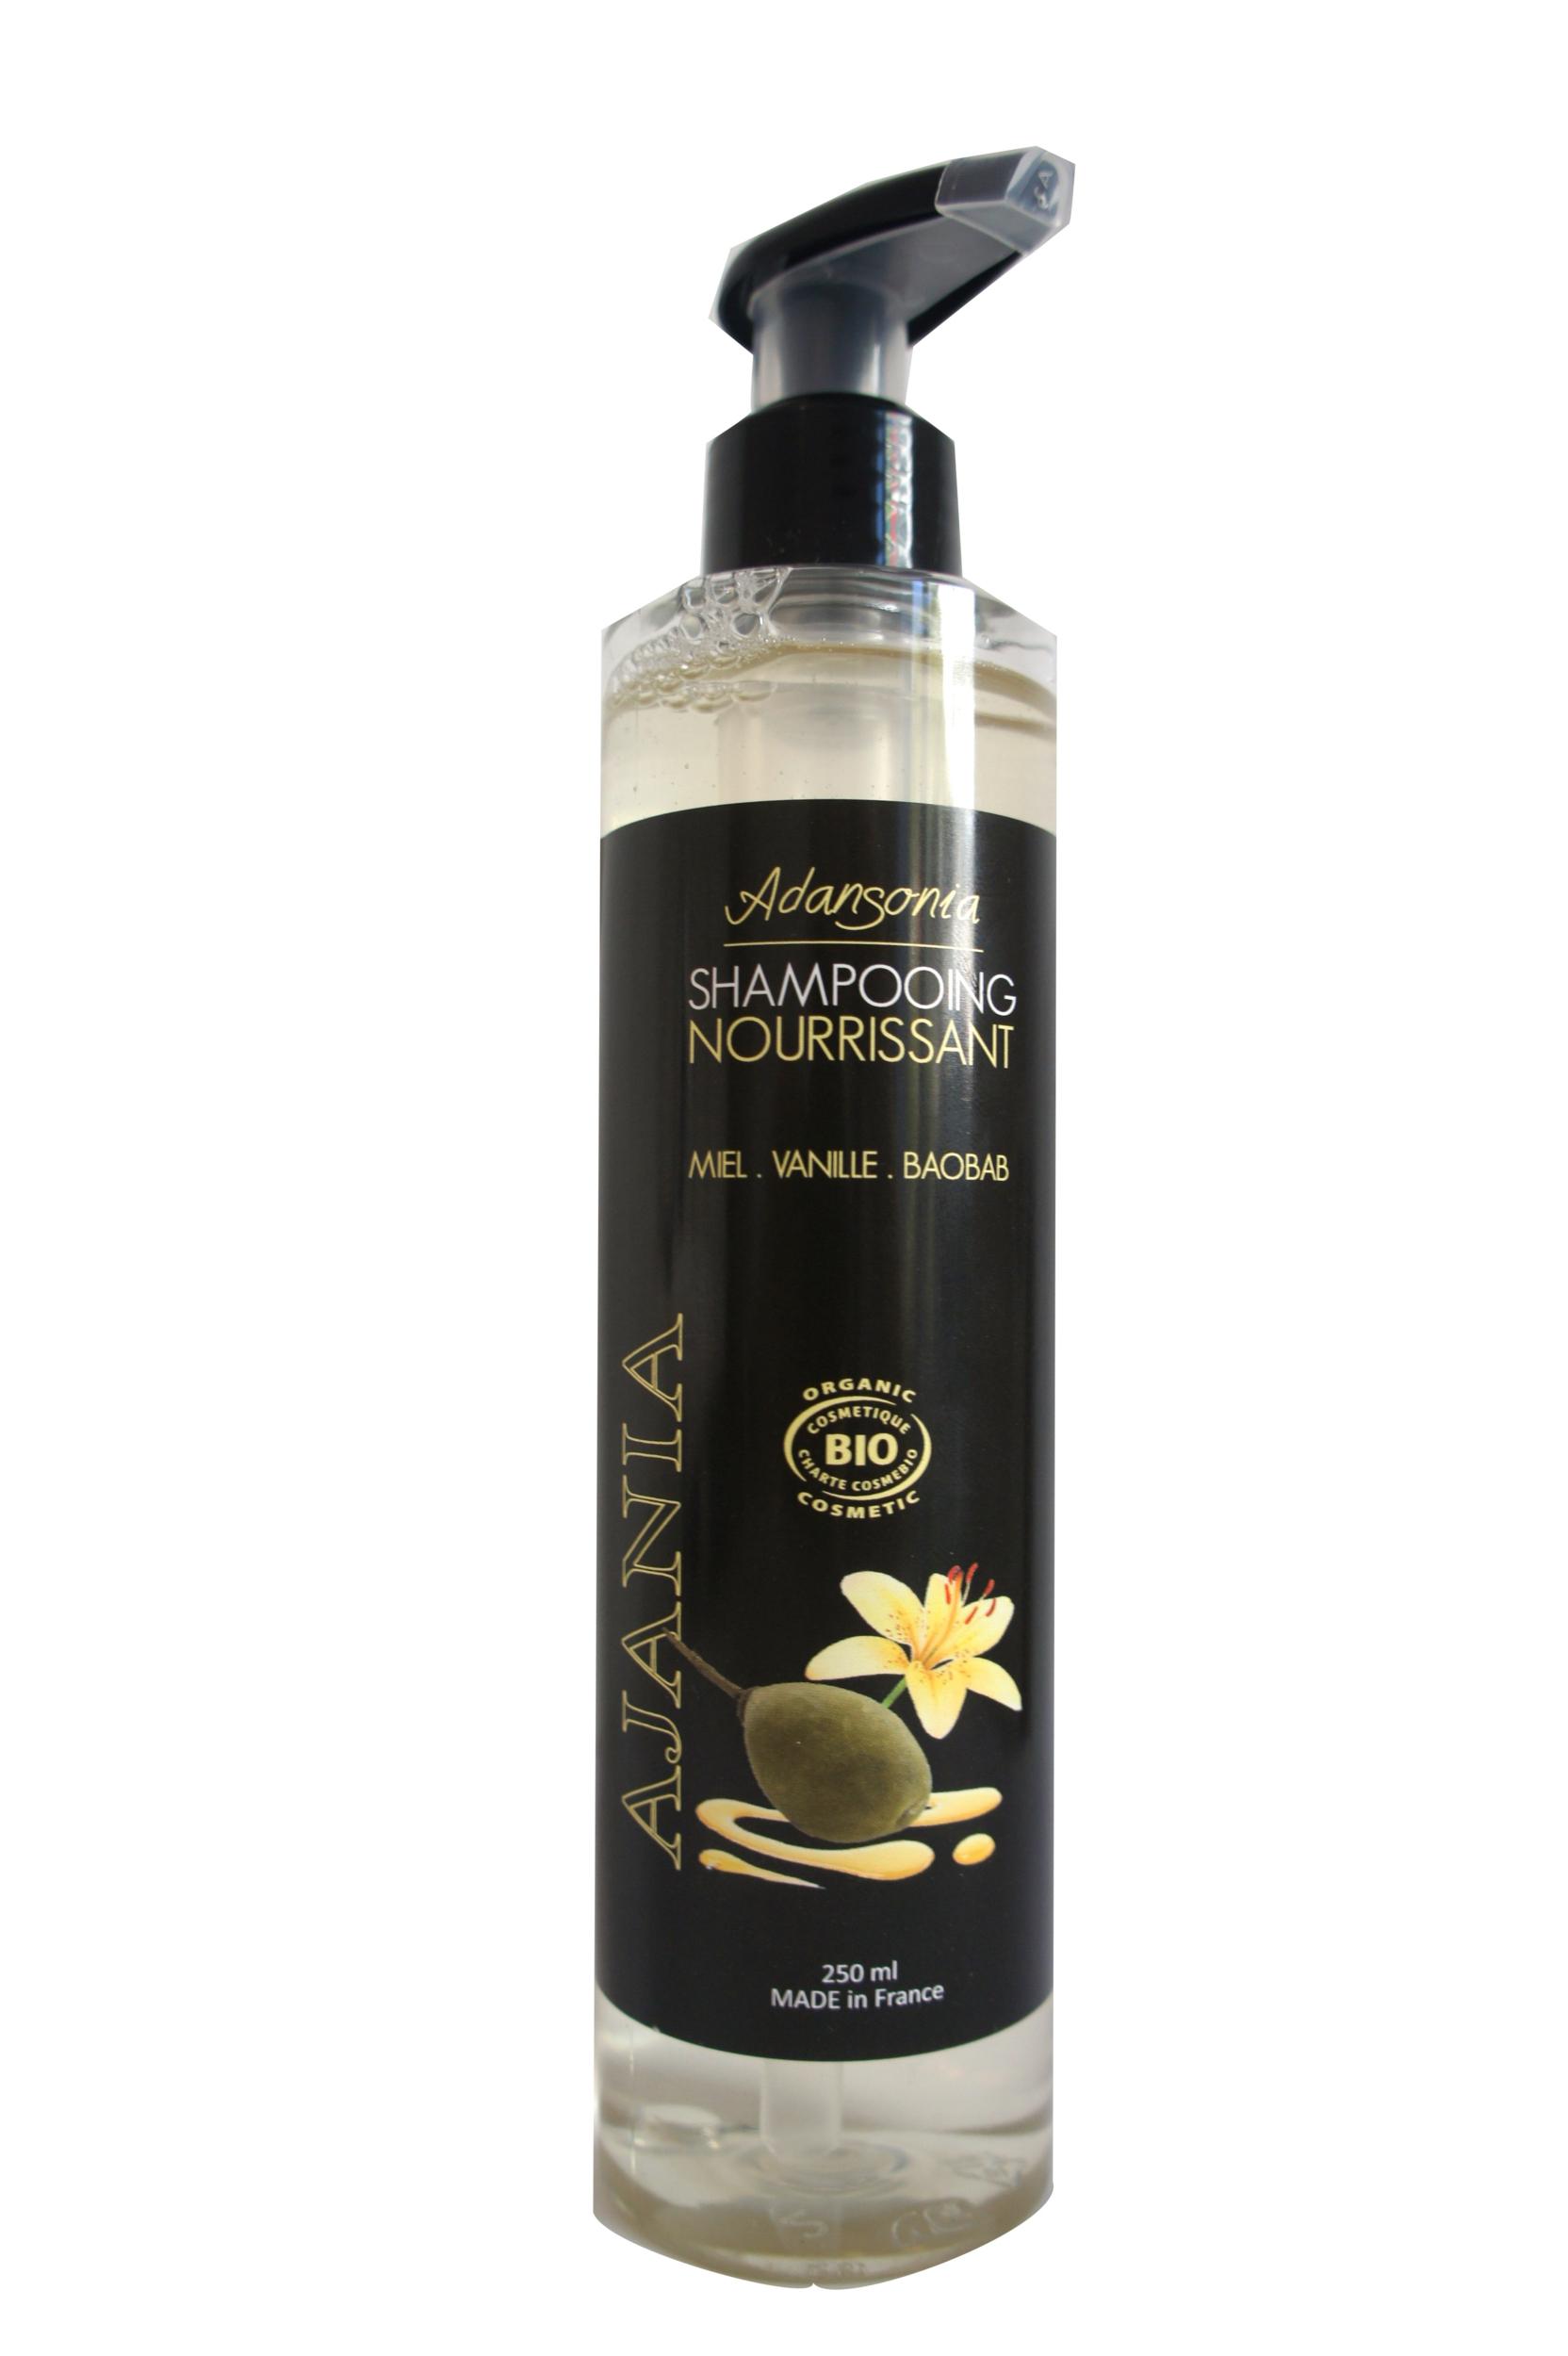 Ajania Adansonia- Repair\'Demel - Après-Shampooing bio - 250 ml - Baobab Argan Eveil des Sens